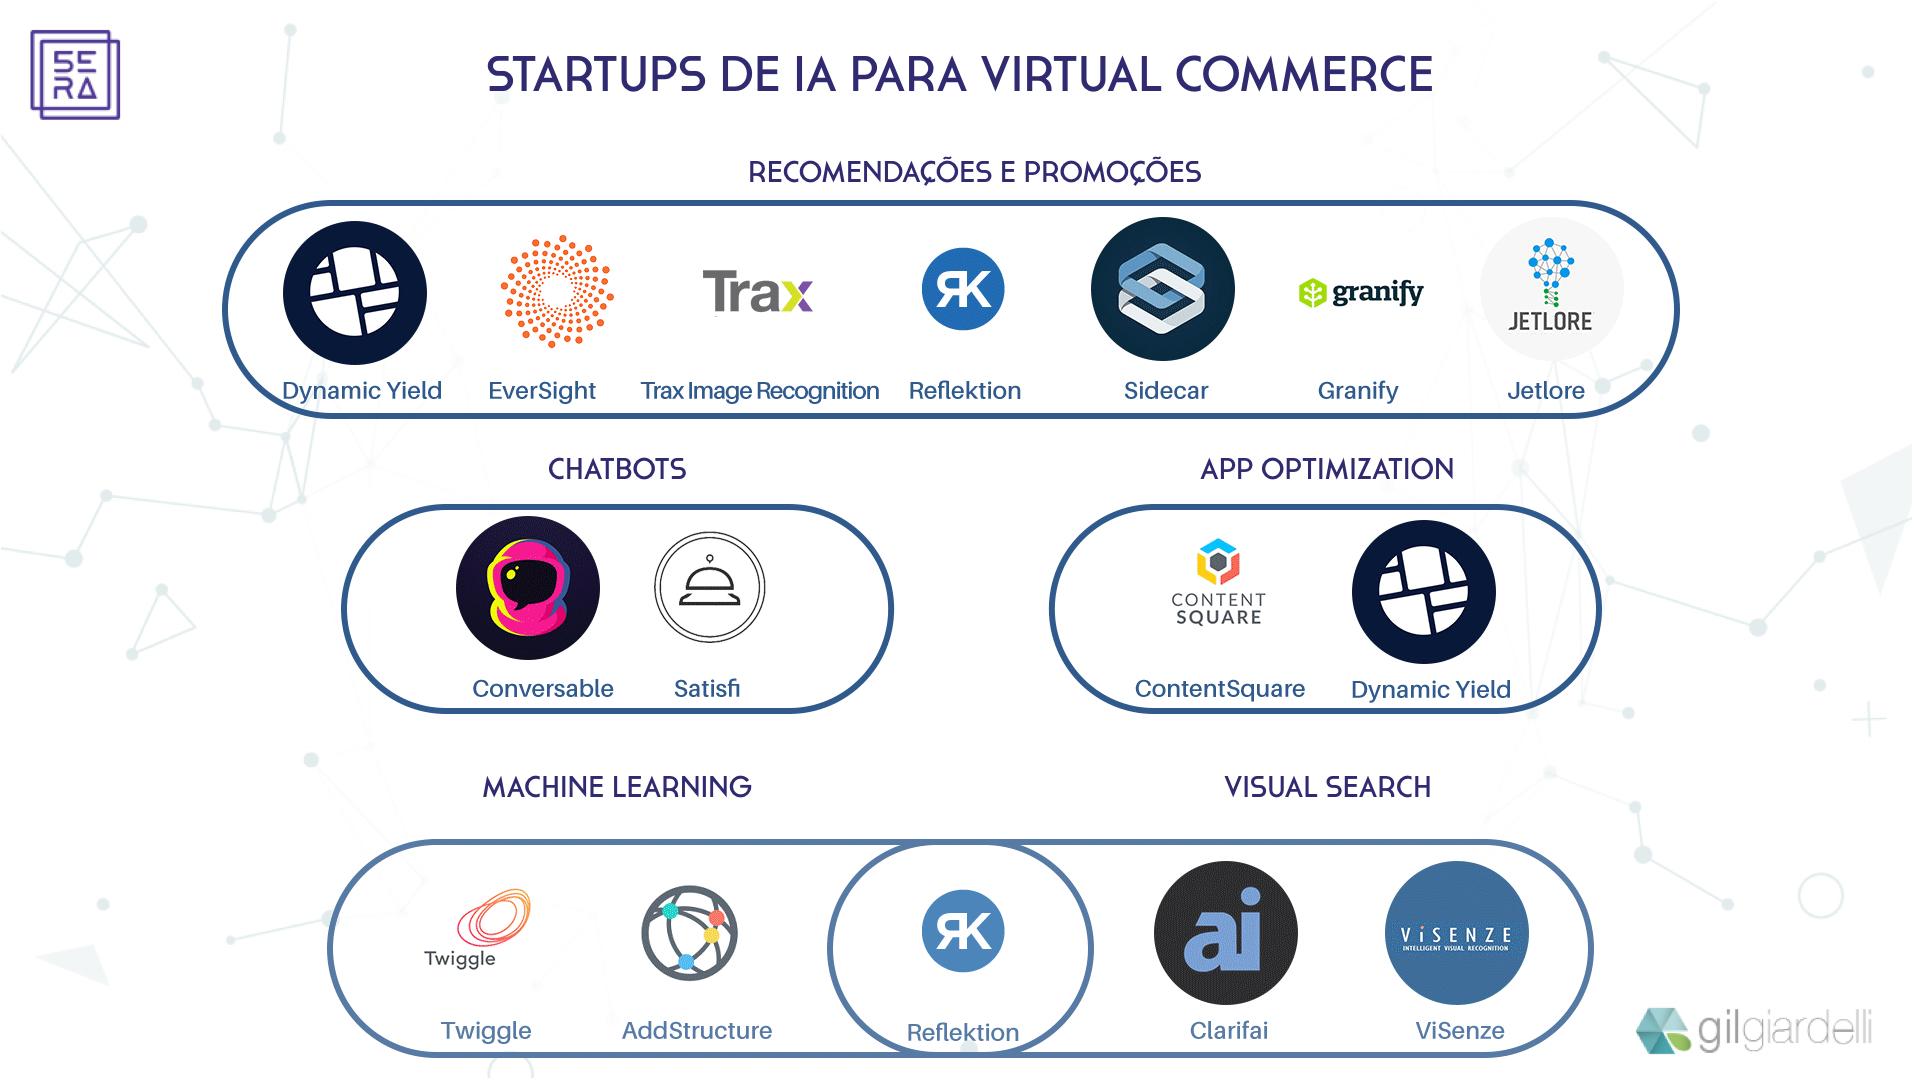 AI Startups for e-commerce